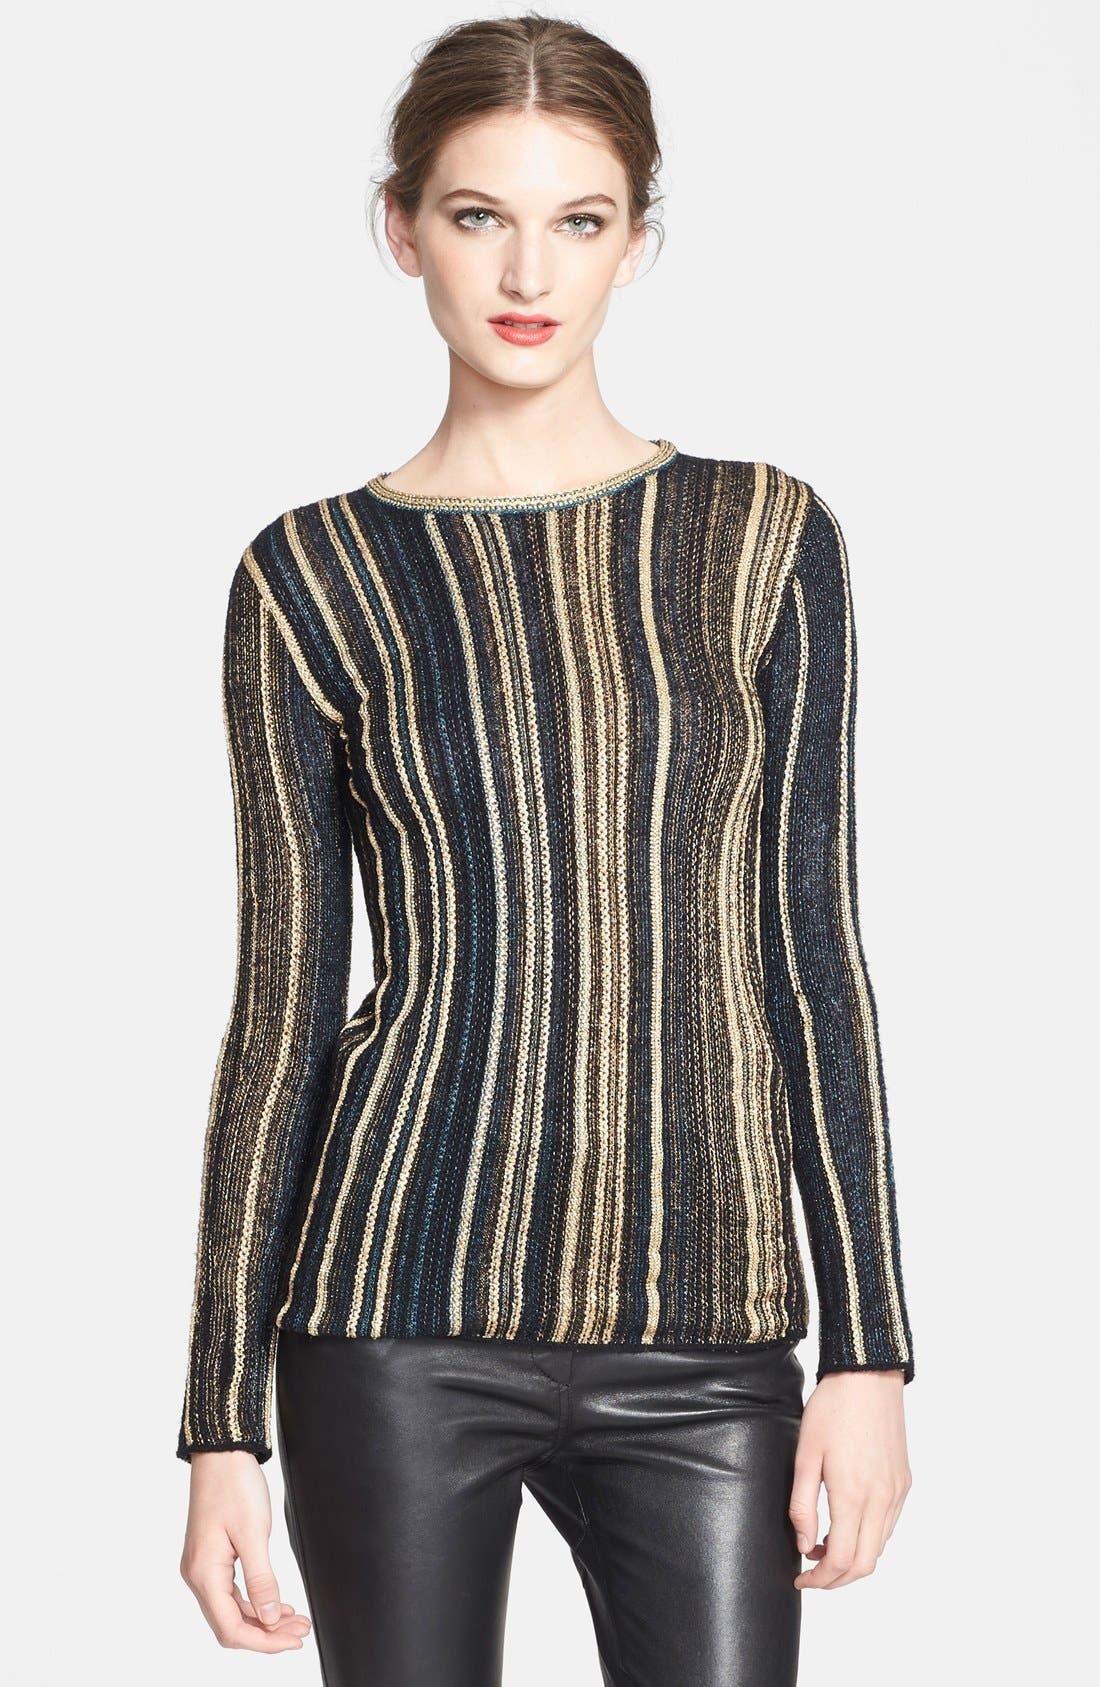 Main Image - M Missoni Vertical Stripe Knit Top